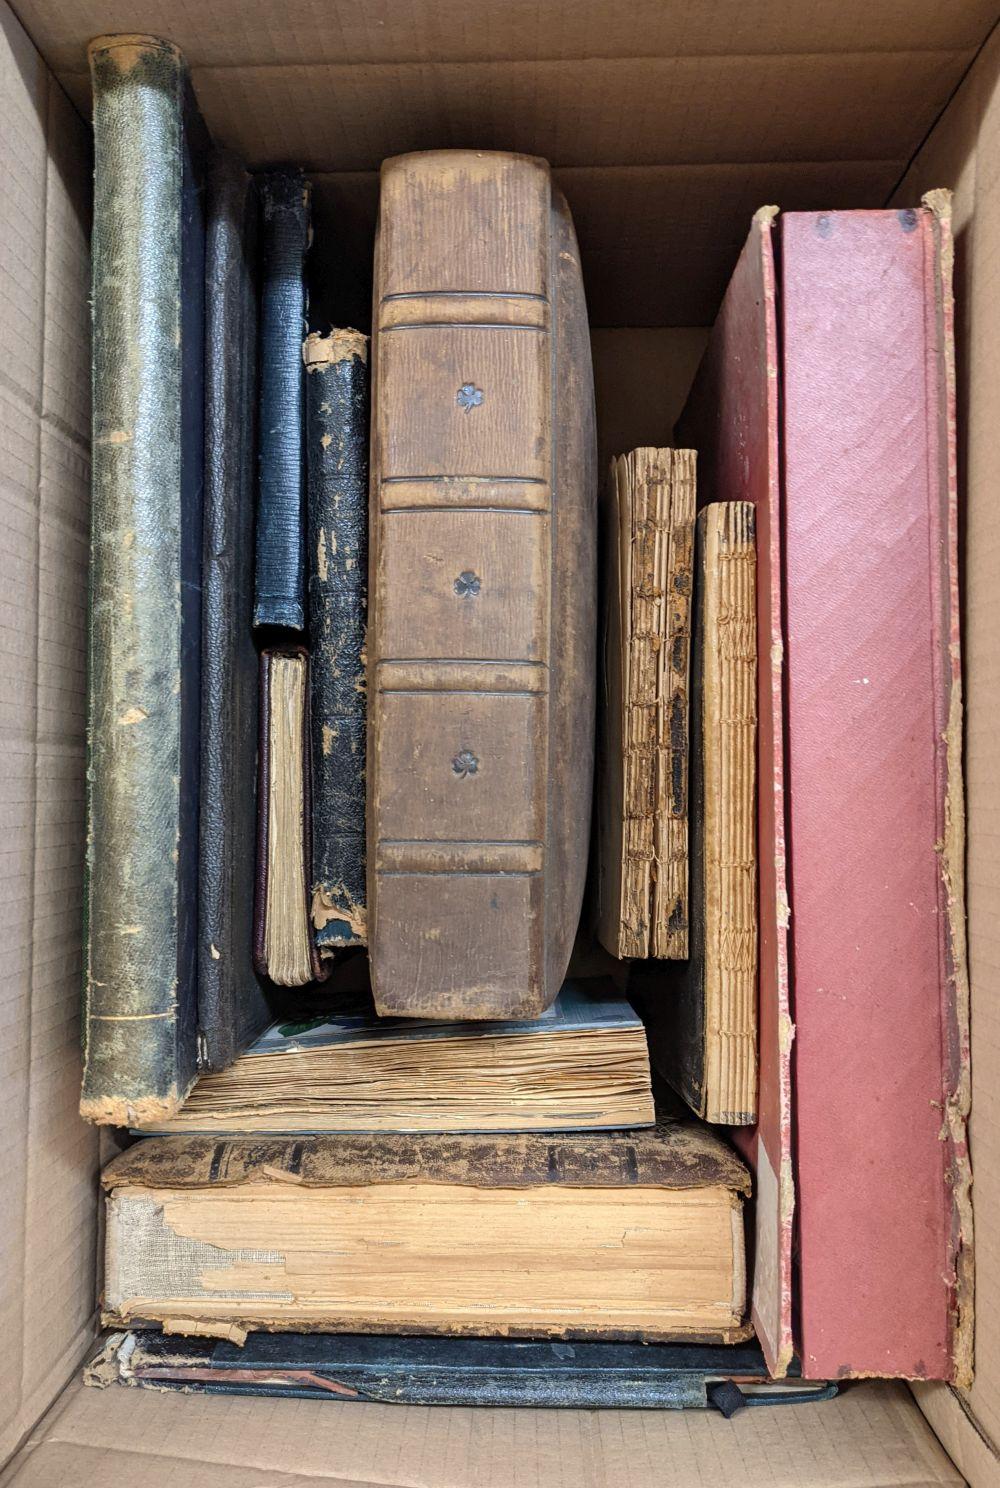 * Miscellaneous Ephemera, mostly 19th & 20th century